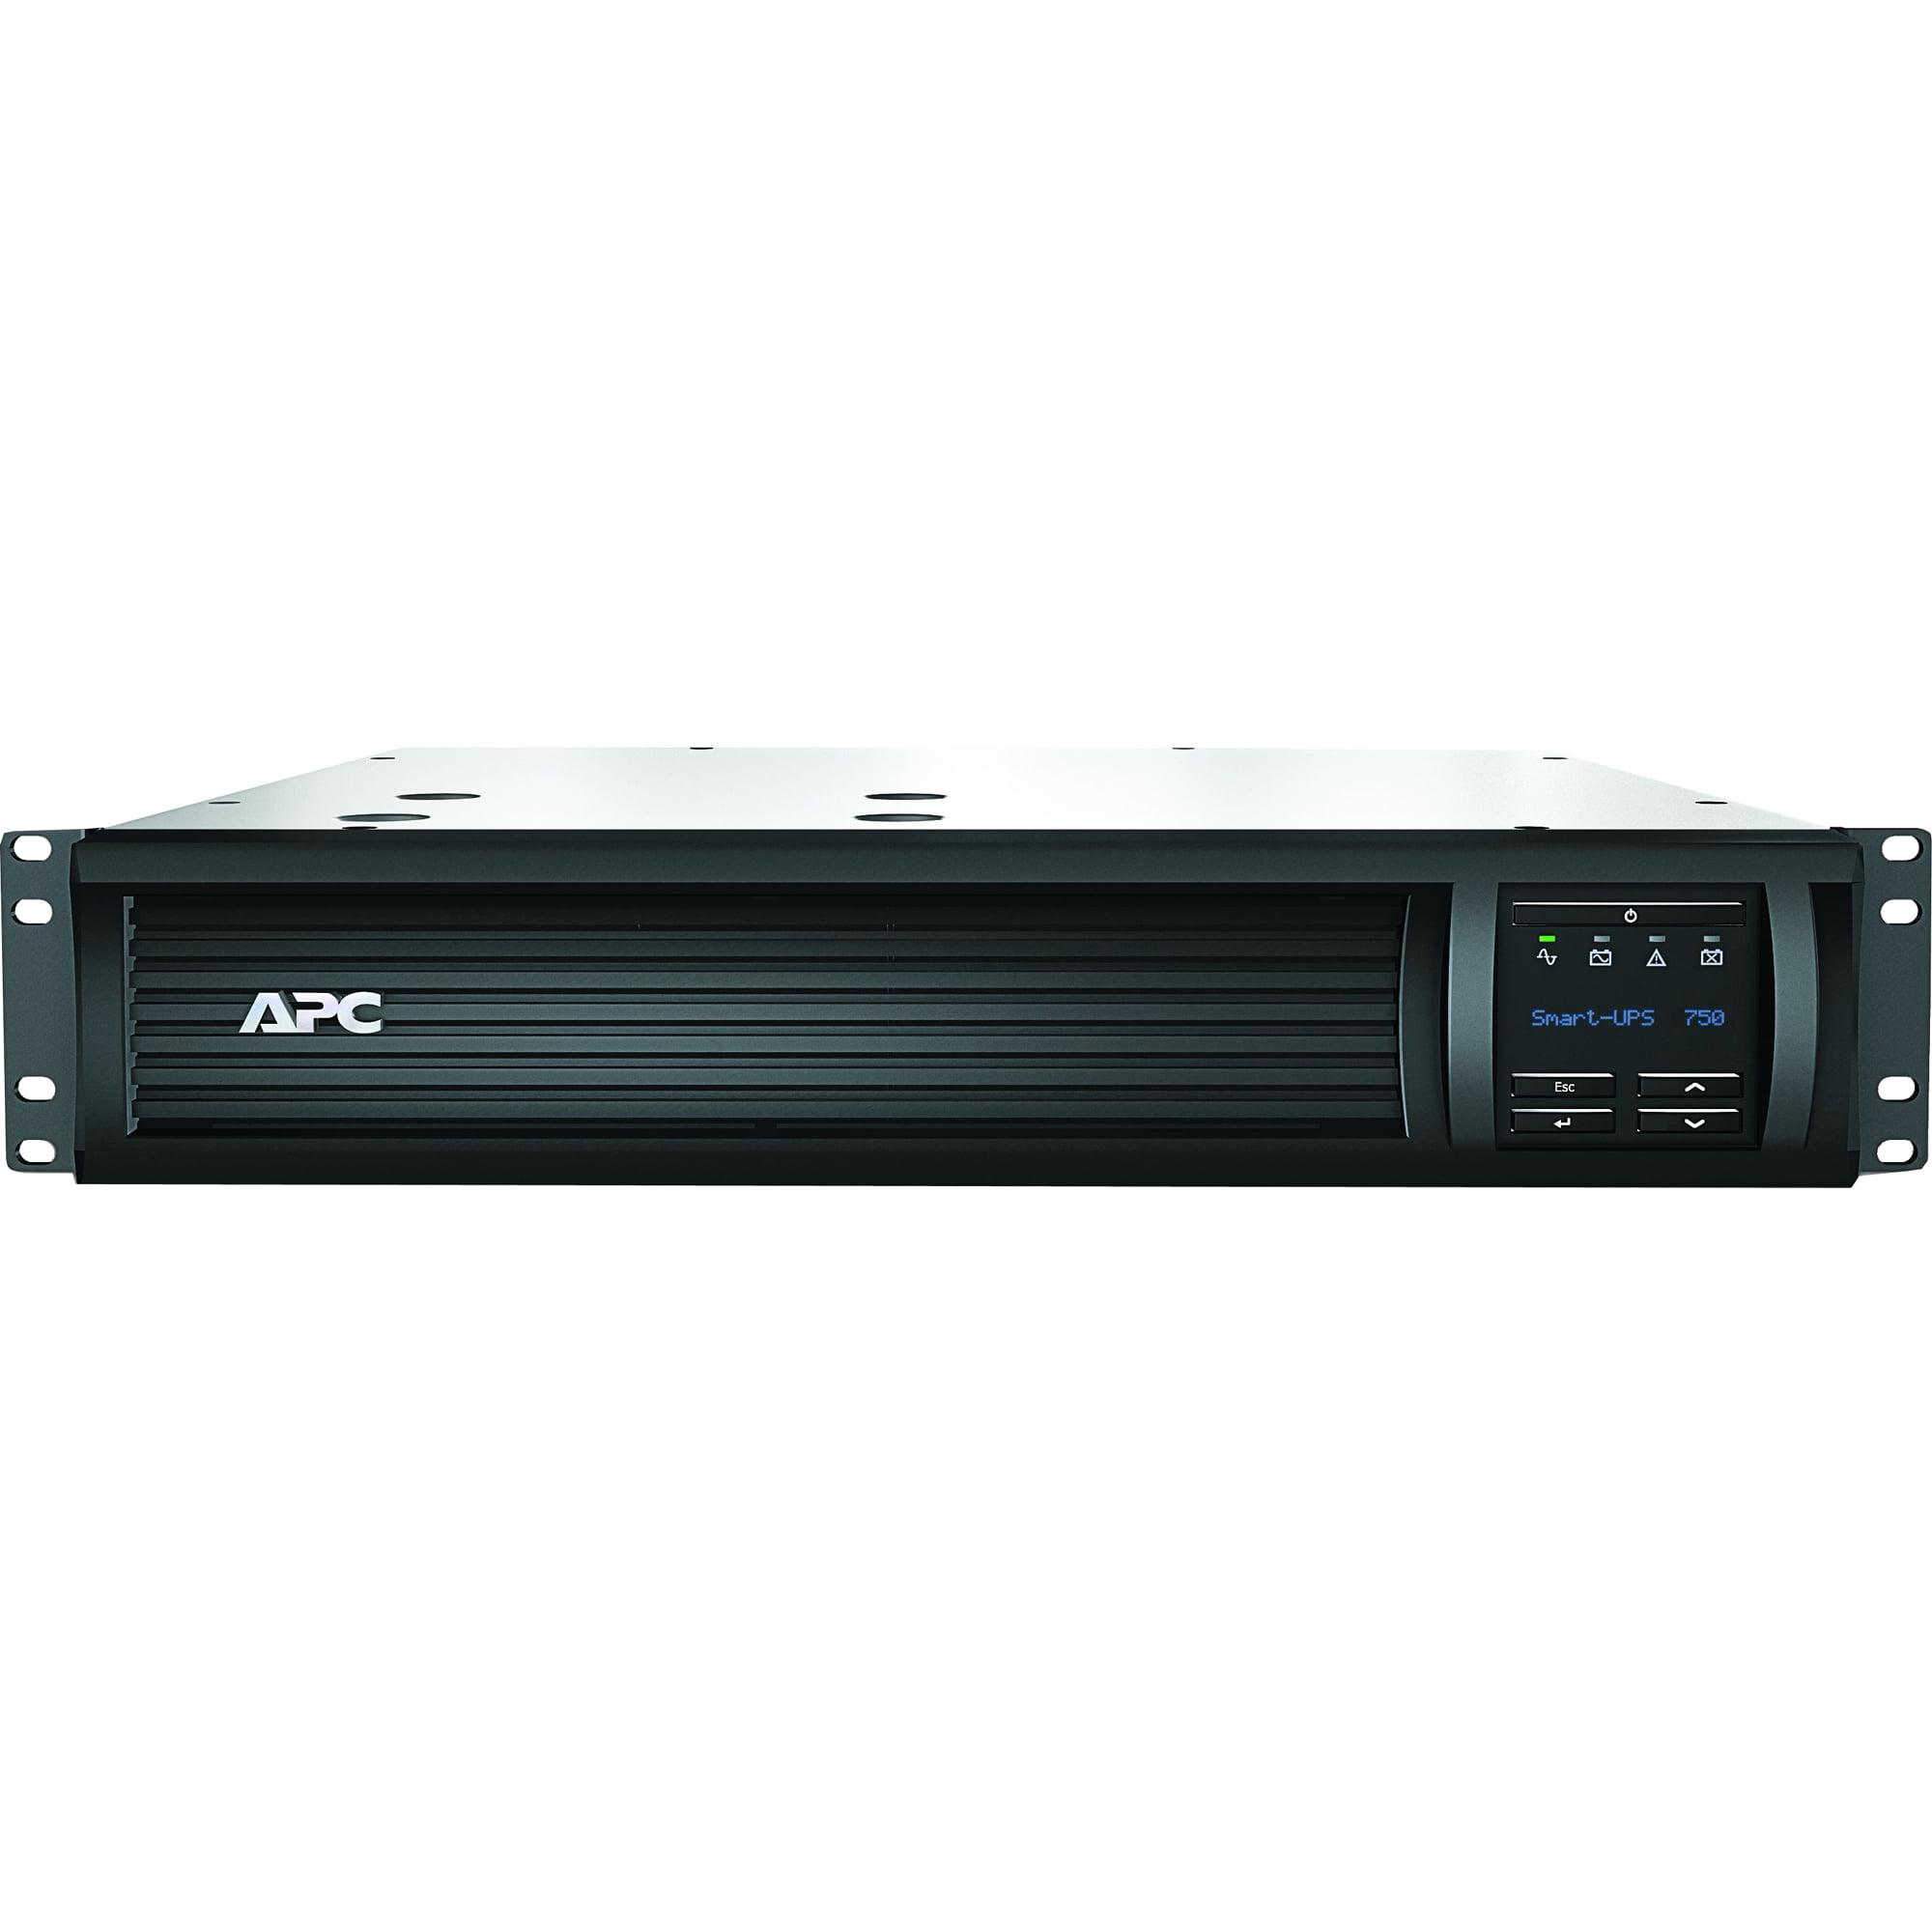 APC Smart-UPS 750 LCD UPS 500 Watt 750 VA by APC